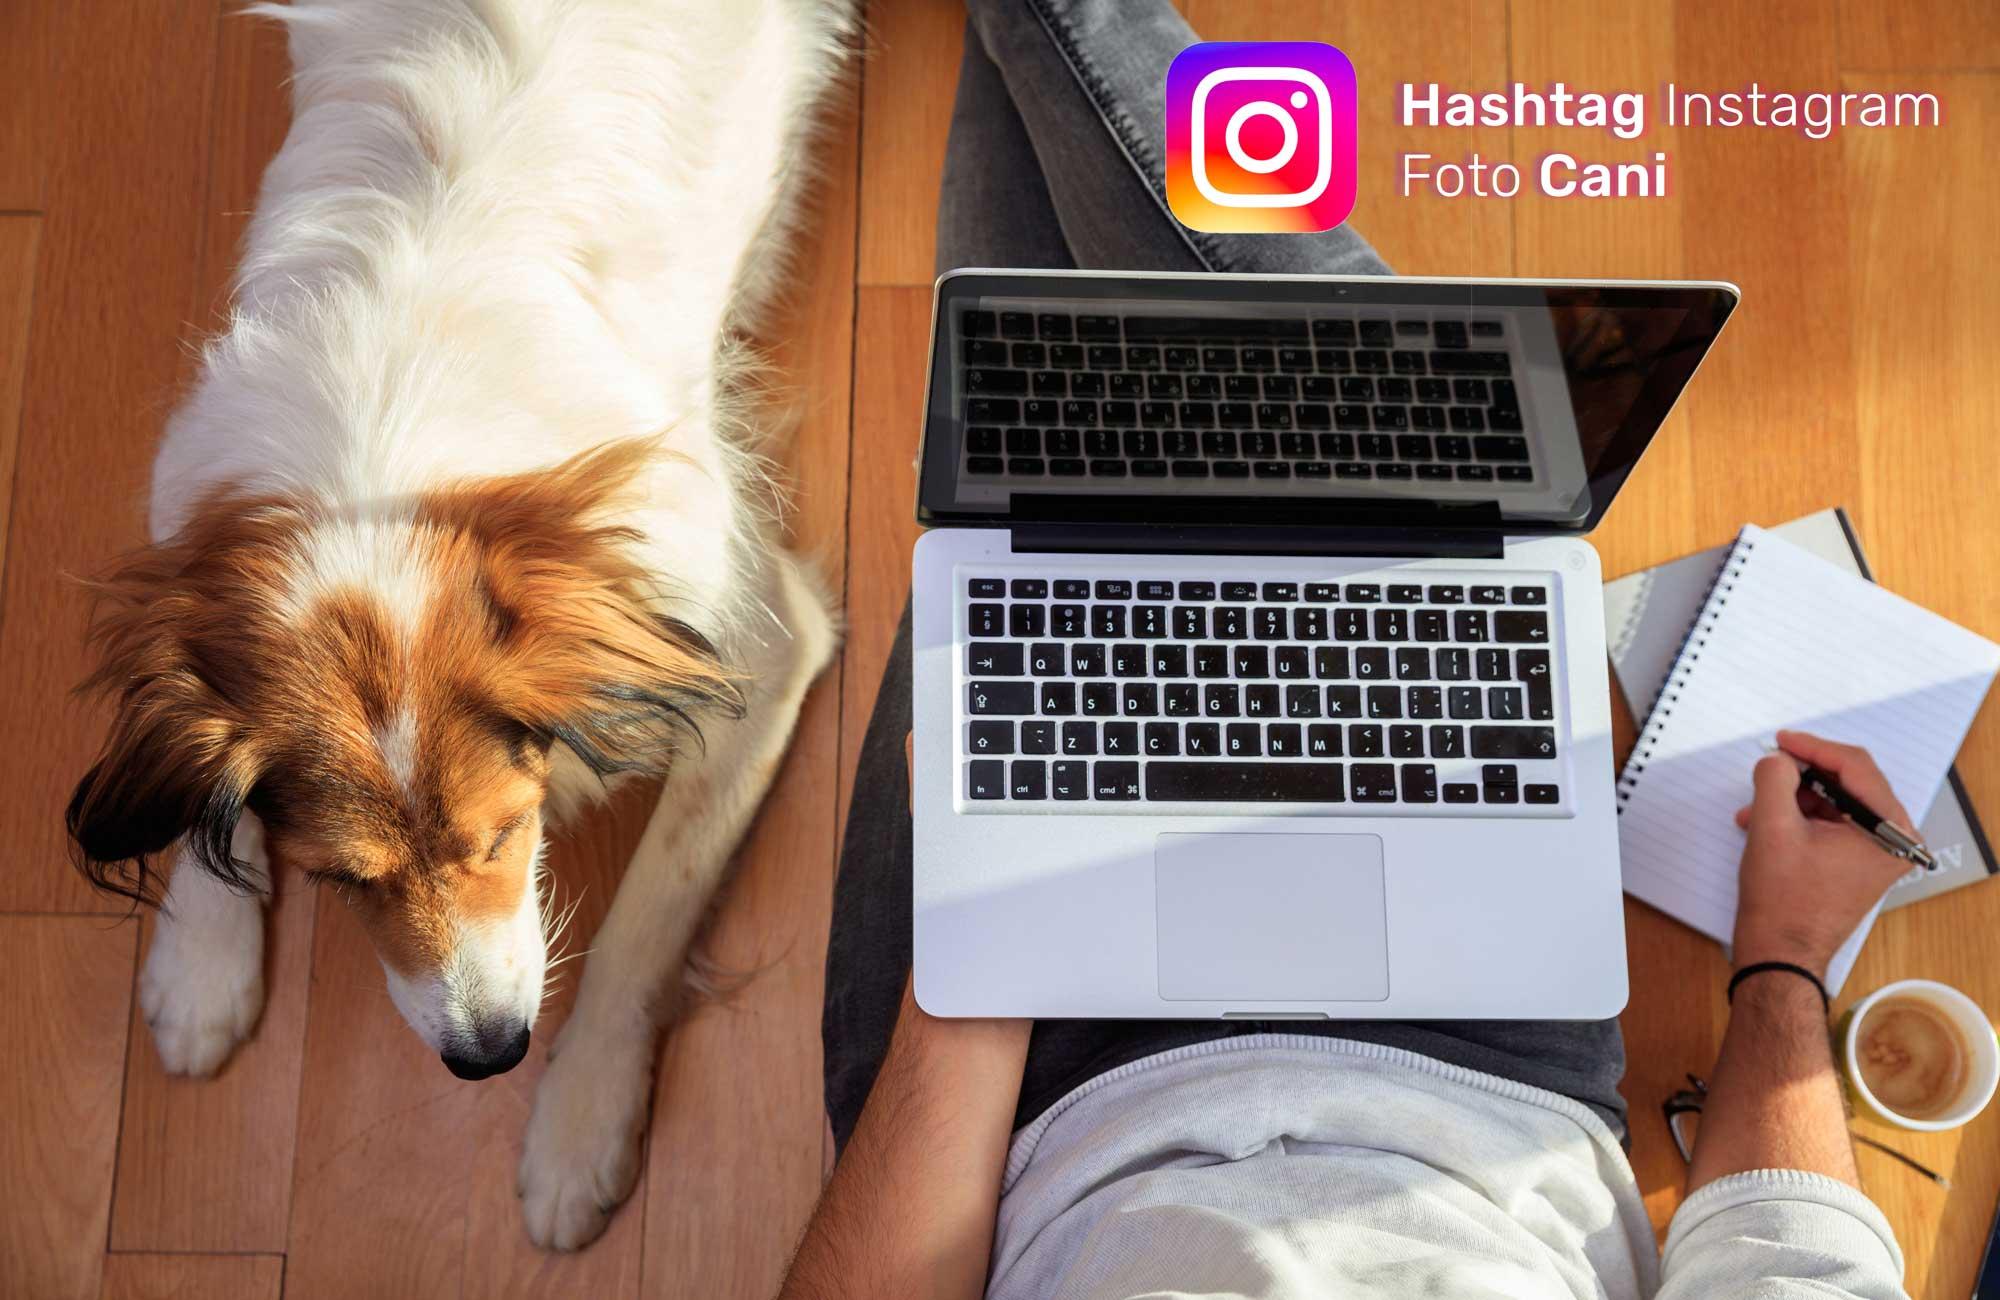 migliori-hashtag-foto-cane-Instagram